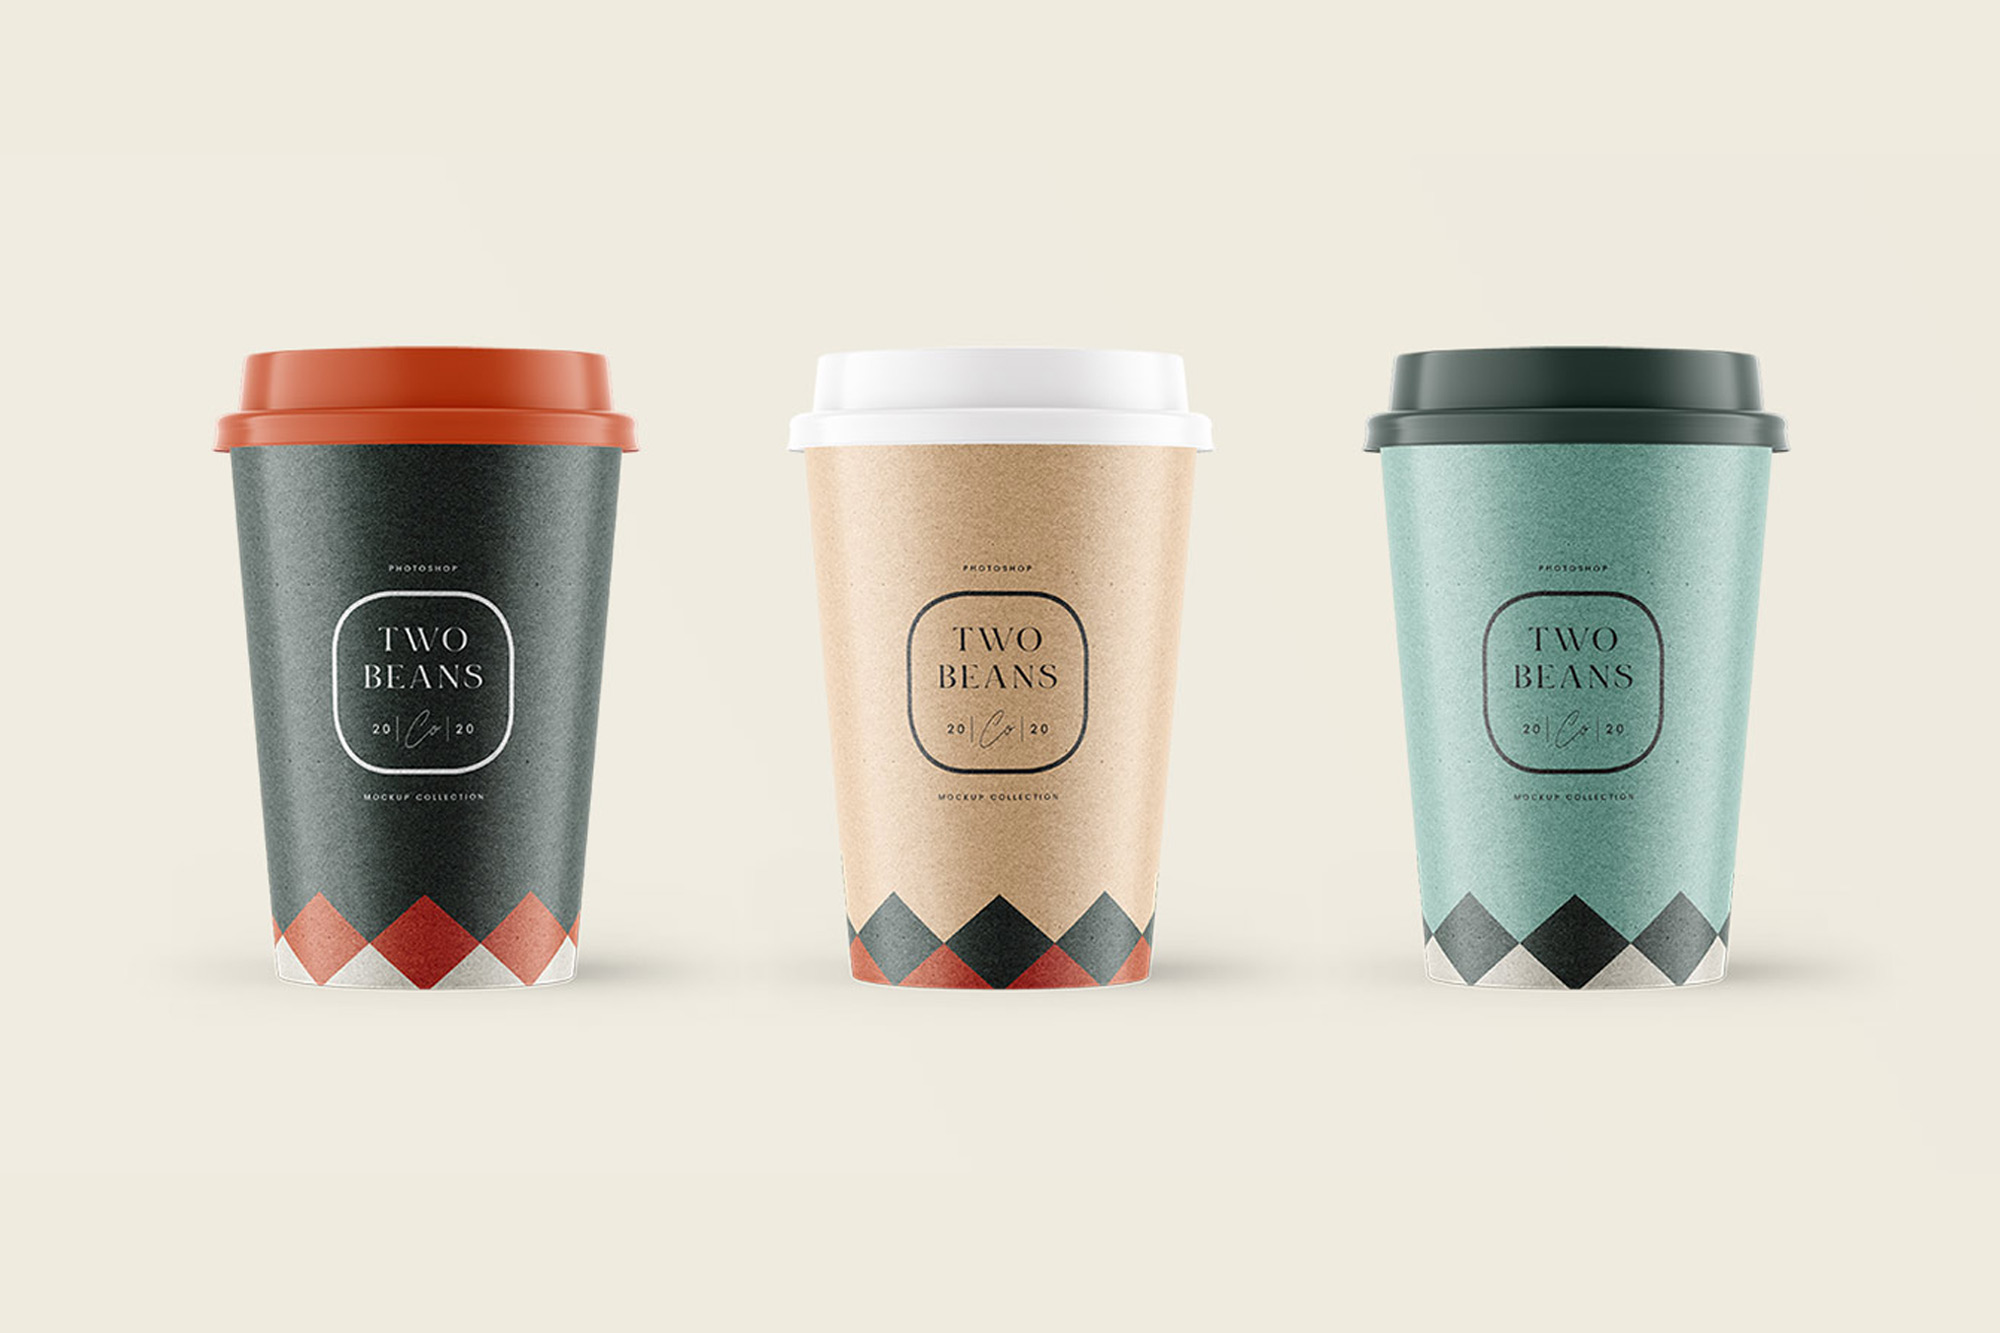 Descarga gratis mockup de taza o vaso de café para llevar. Recursos para diseñadores.